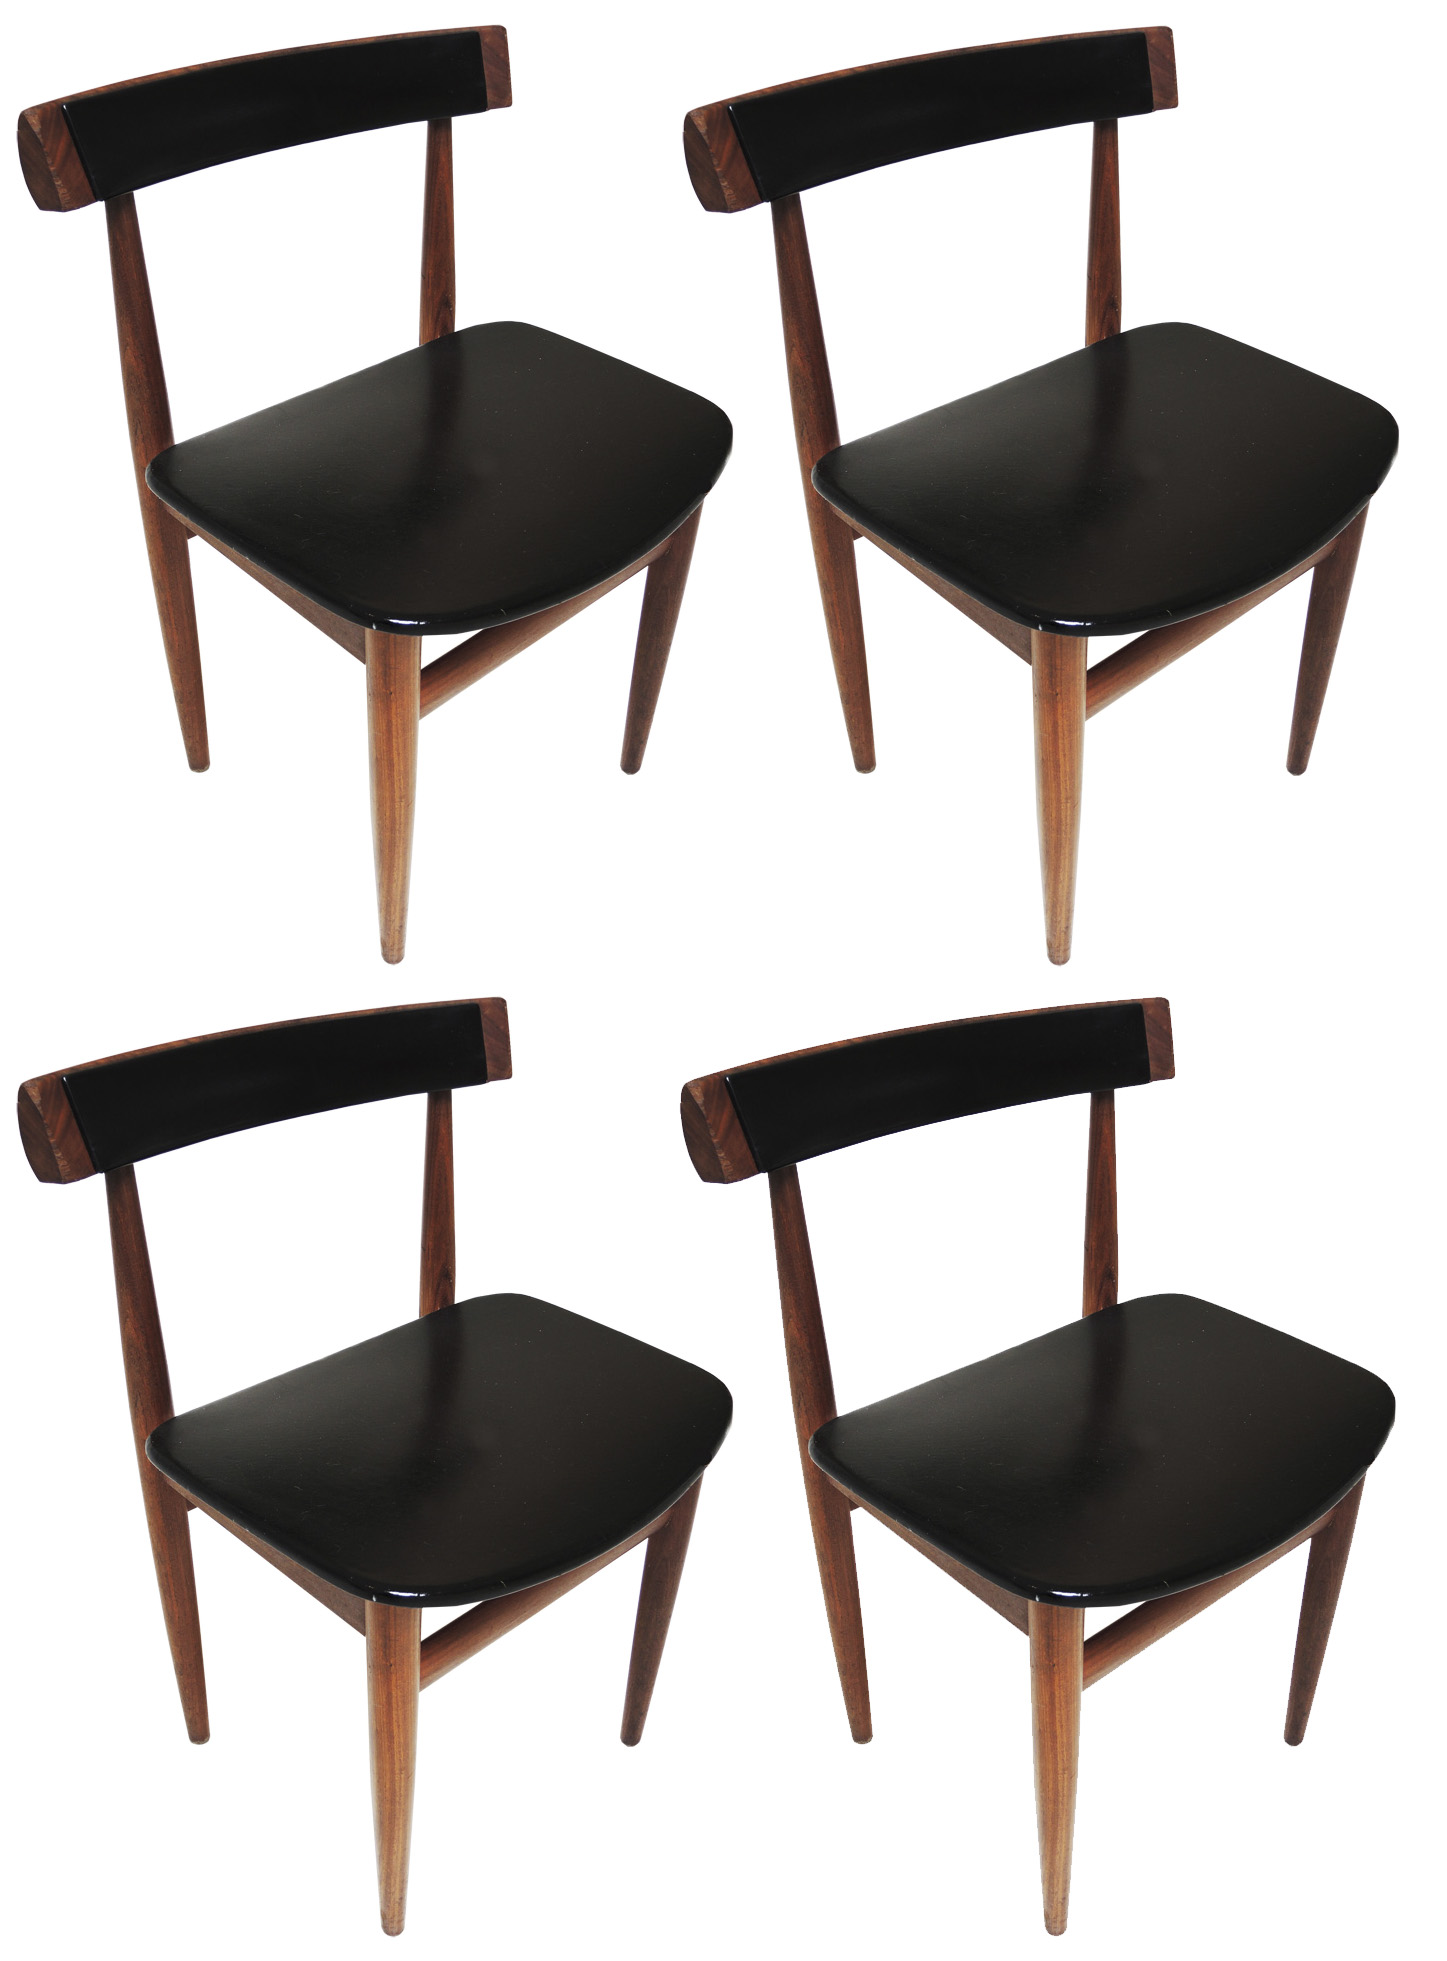 Hans Olsen Dining Chairs INabstracto : hans olsen dining chairslr from inabstracto.wordpress.com size 1447 x 1961 jpeg 274kB